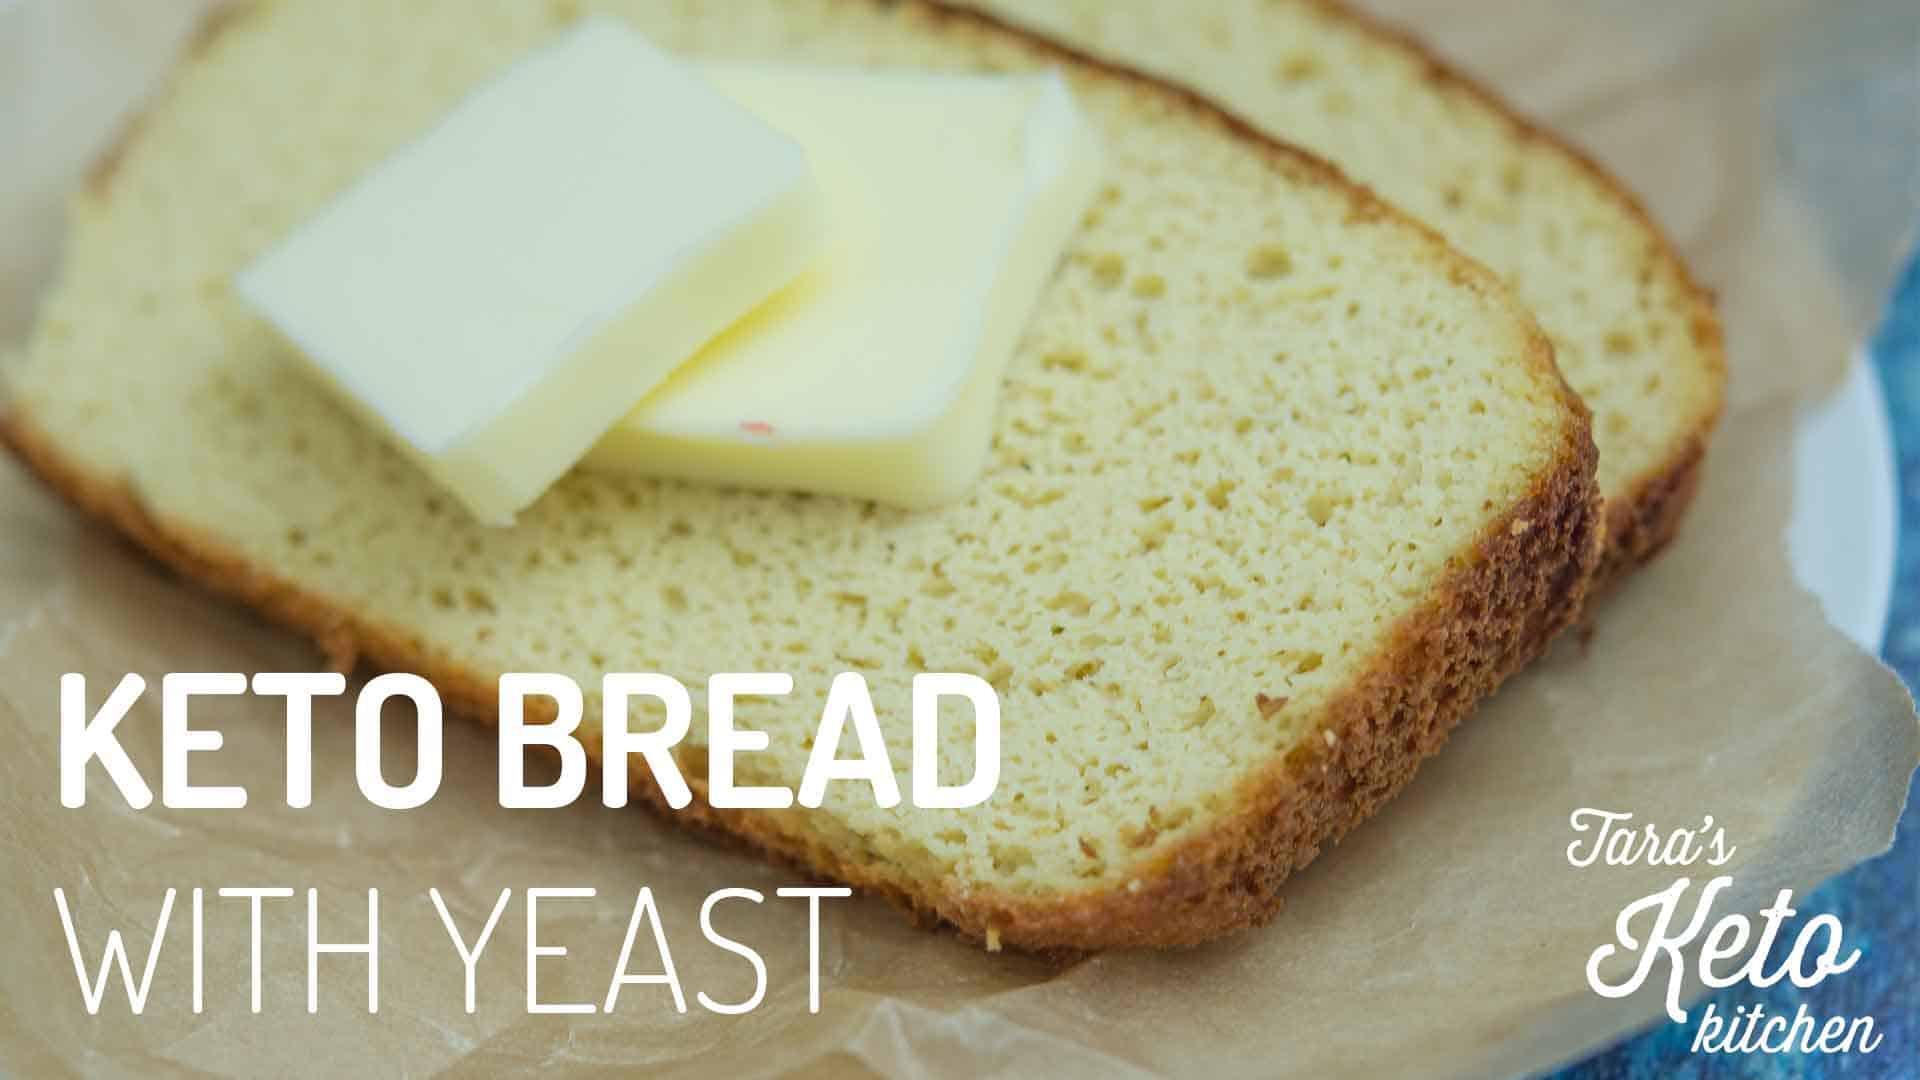 Keto Sandwich Bread Recipes  Keto Coconut Flour Bread with Yeast Dairy Free Tara s